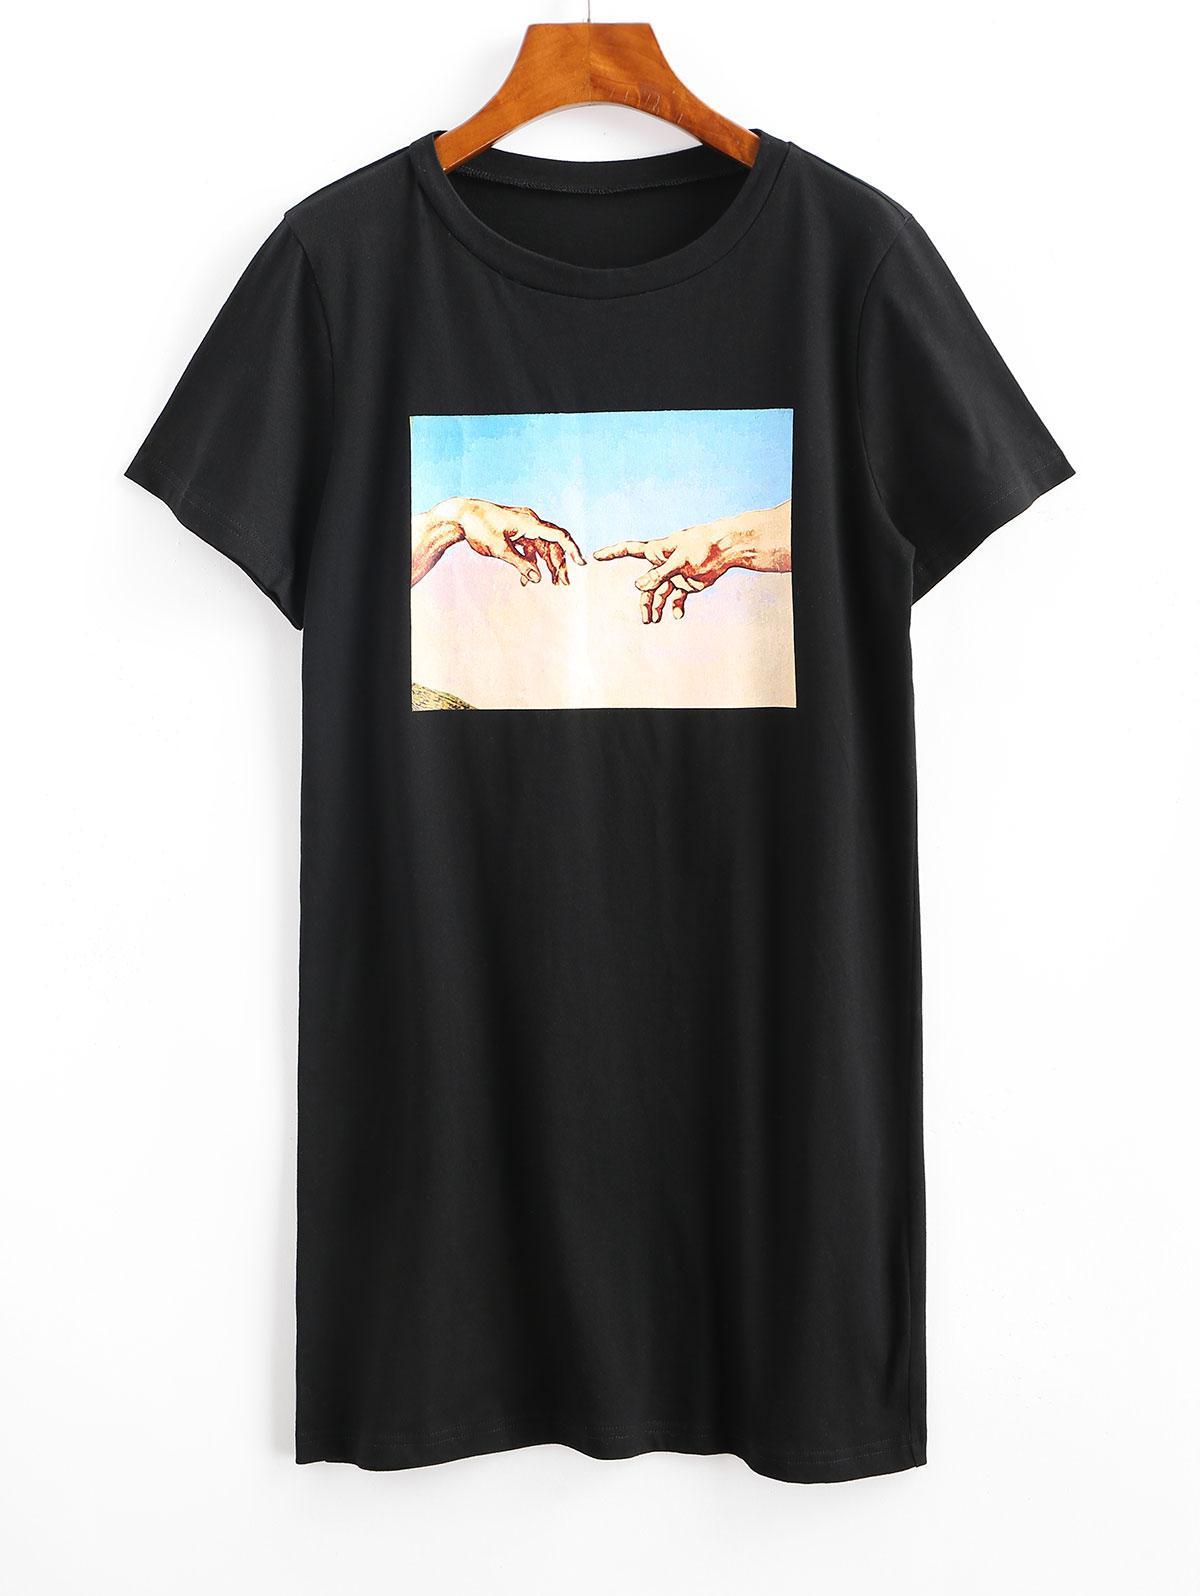 ZAFUL Casual Gesture Graphic T-shirt Dress